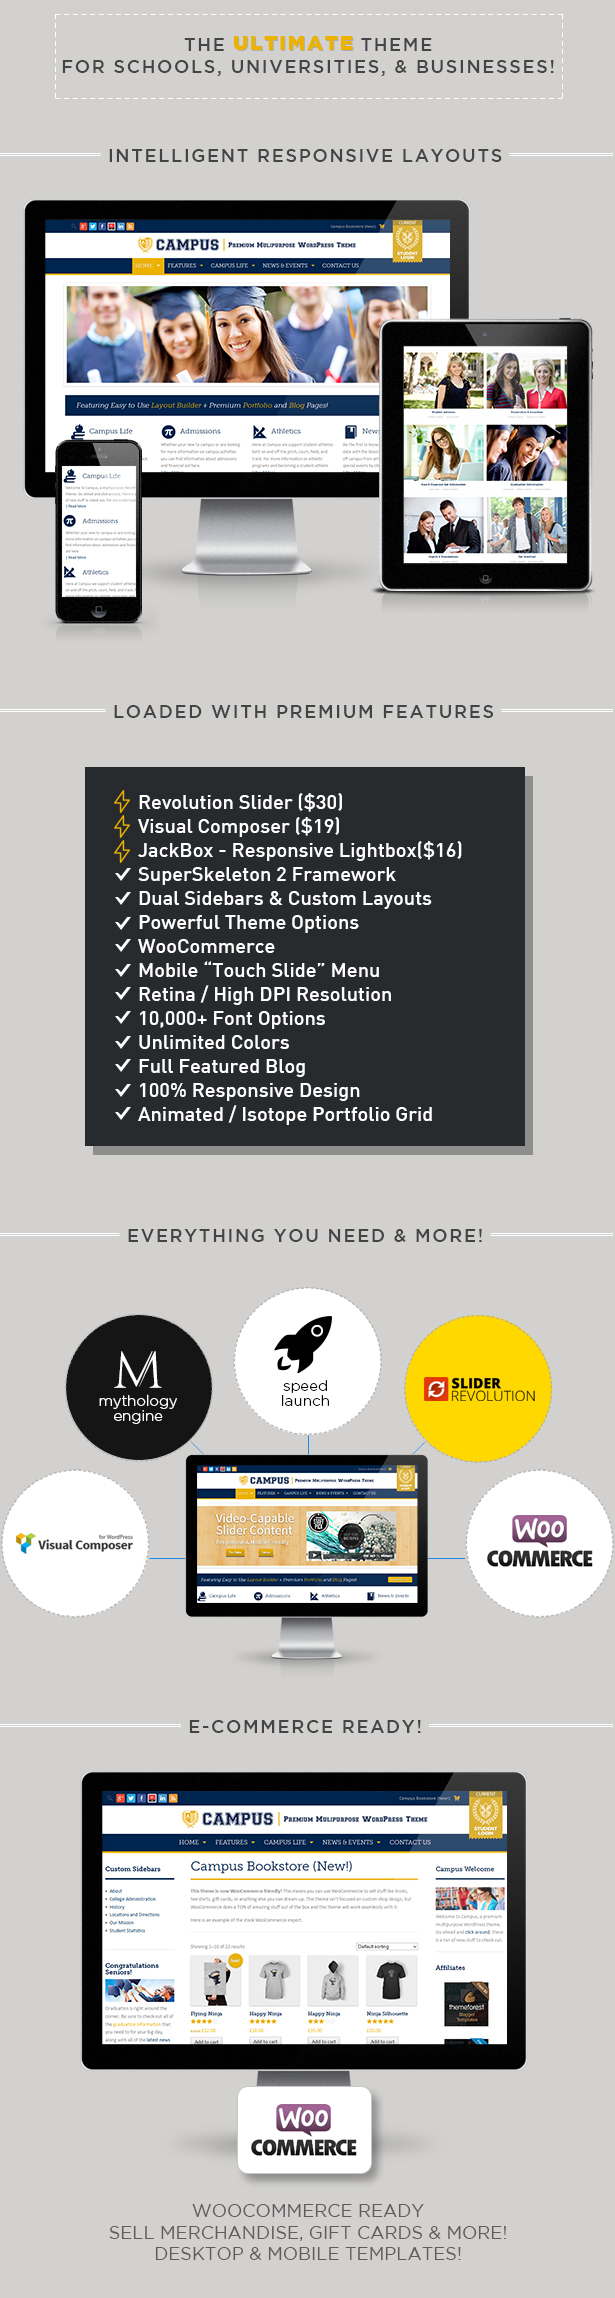 Campus   Multipurpose WordPress Theme - 1